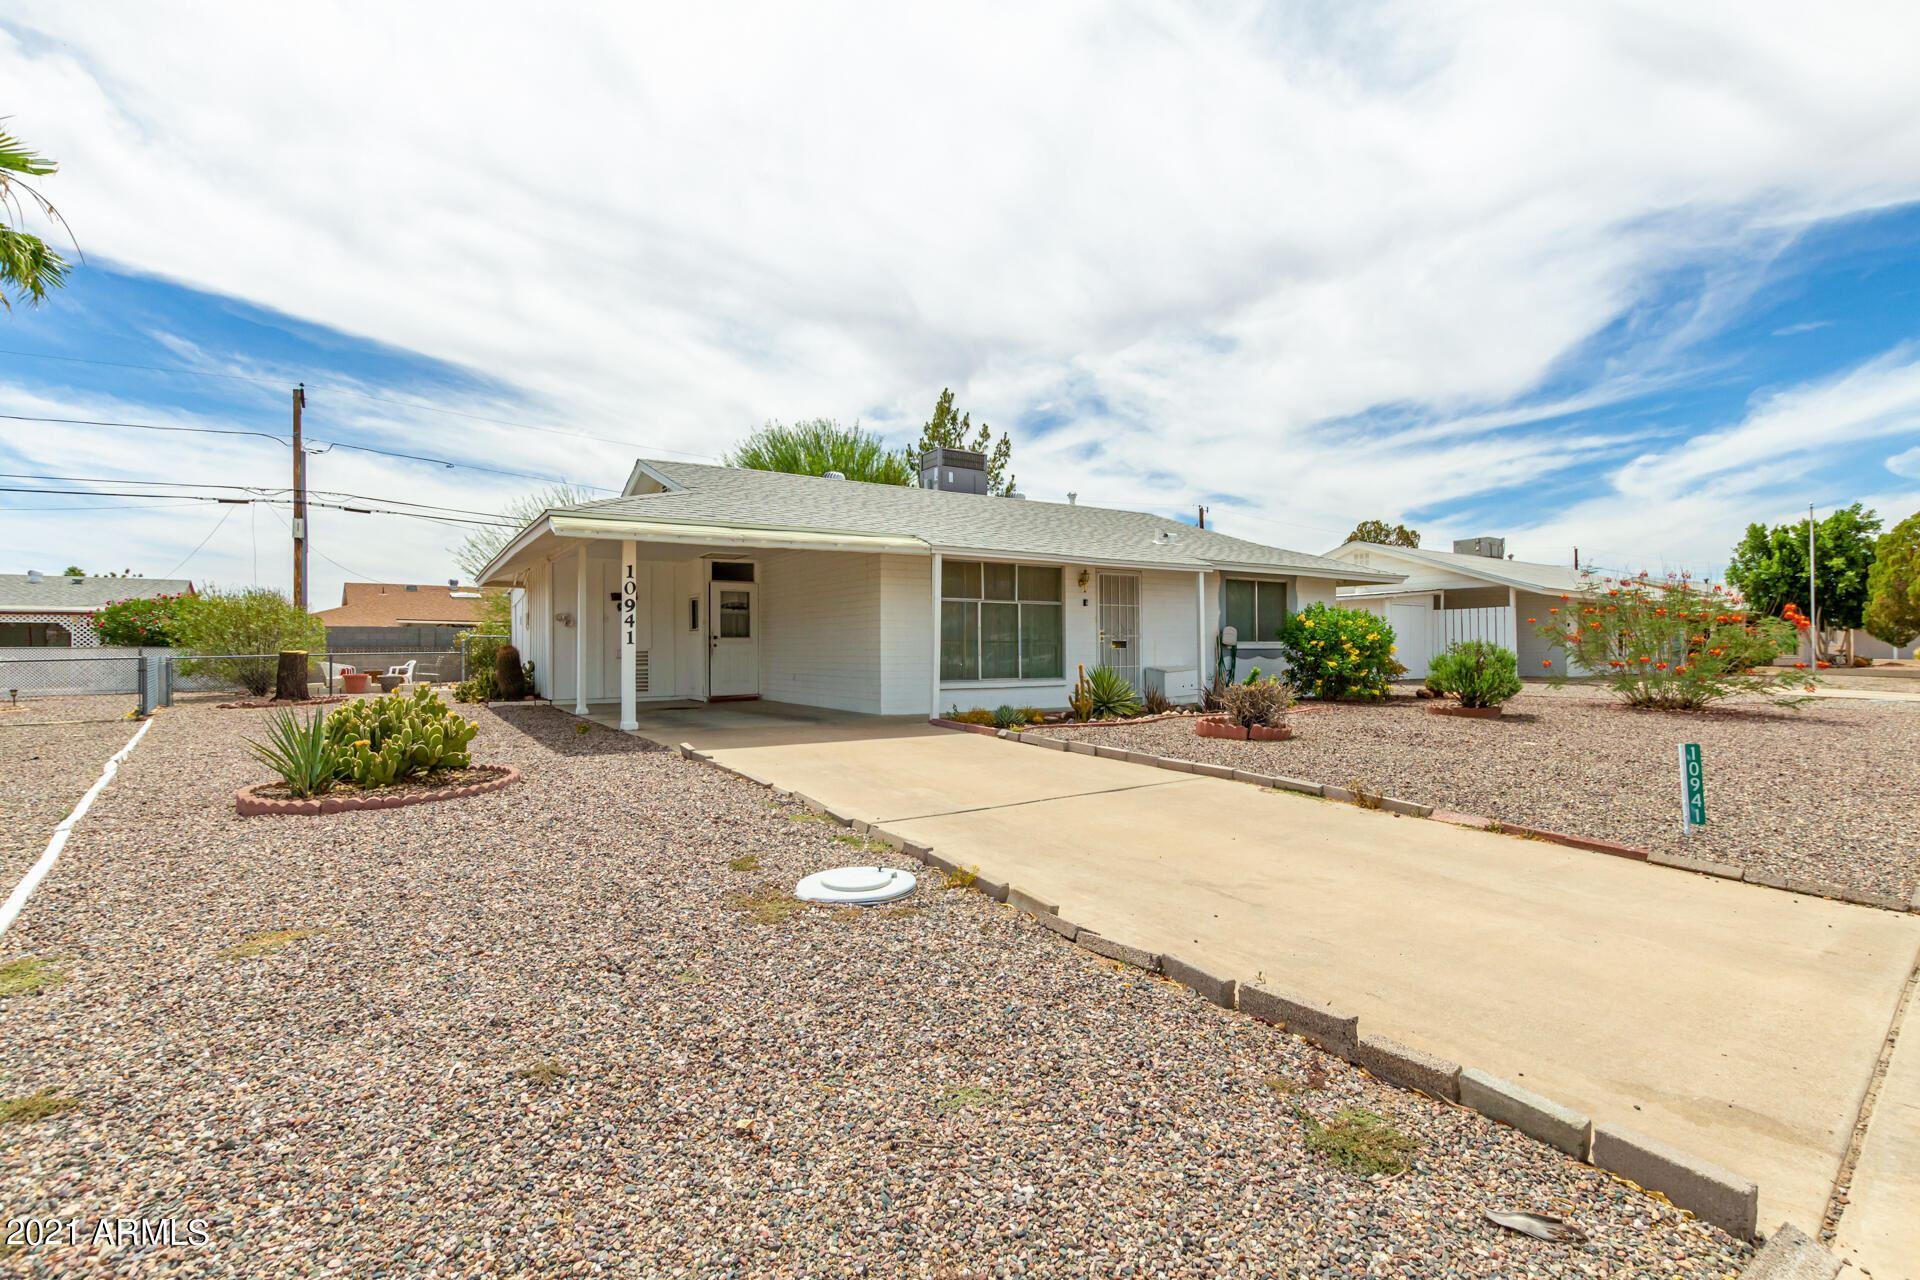 10941 W CHERRY HILLS Drive, Sun City, AZ 85351 - MLS#: 6249429